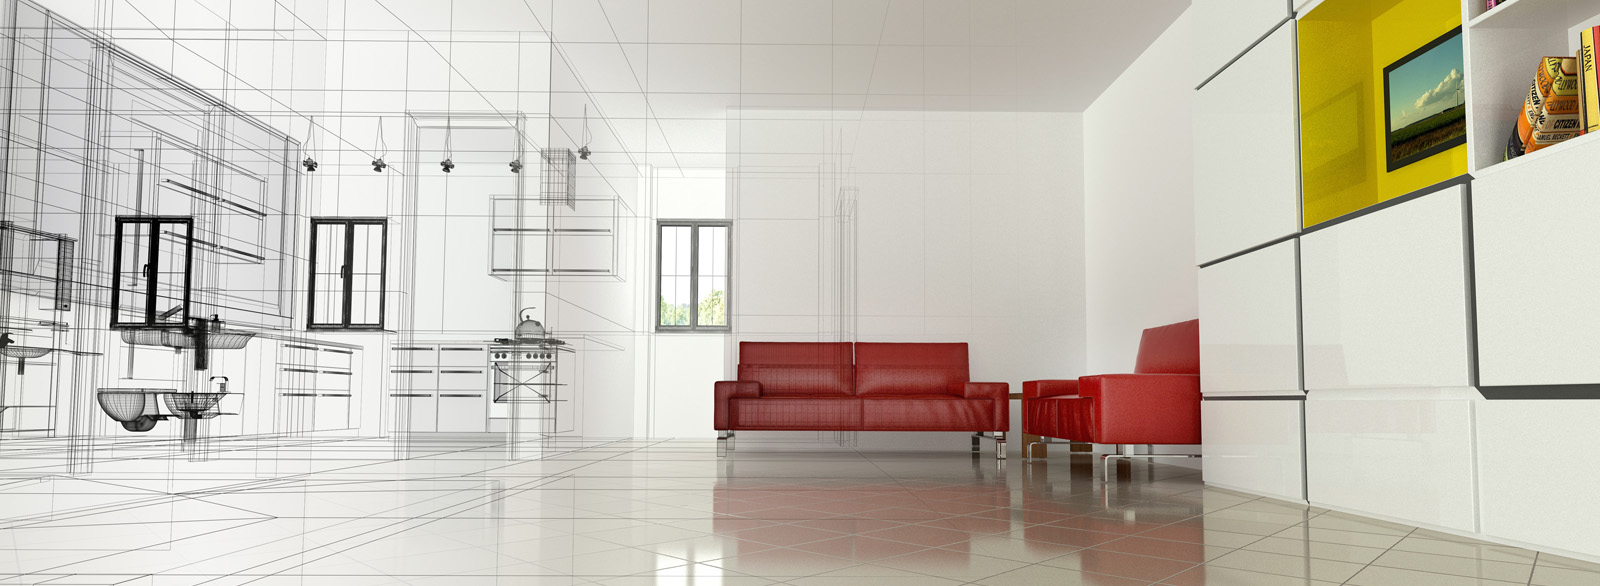 Dise o de oficinas curso de oficinas y espacios p blicos for Estudiar diseno de interiores online